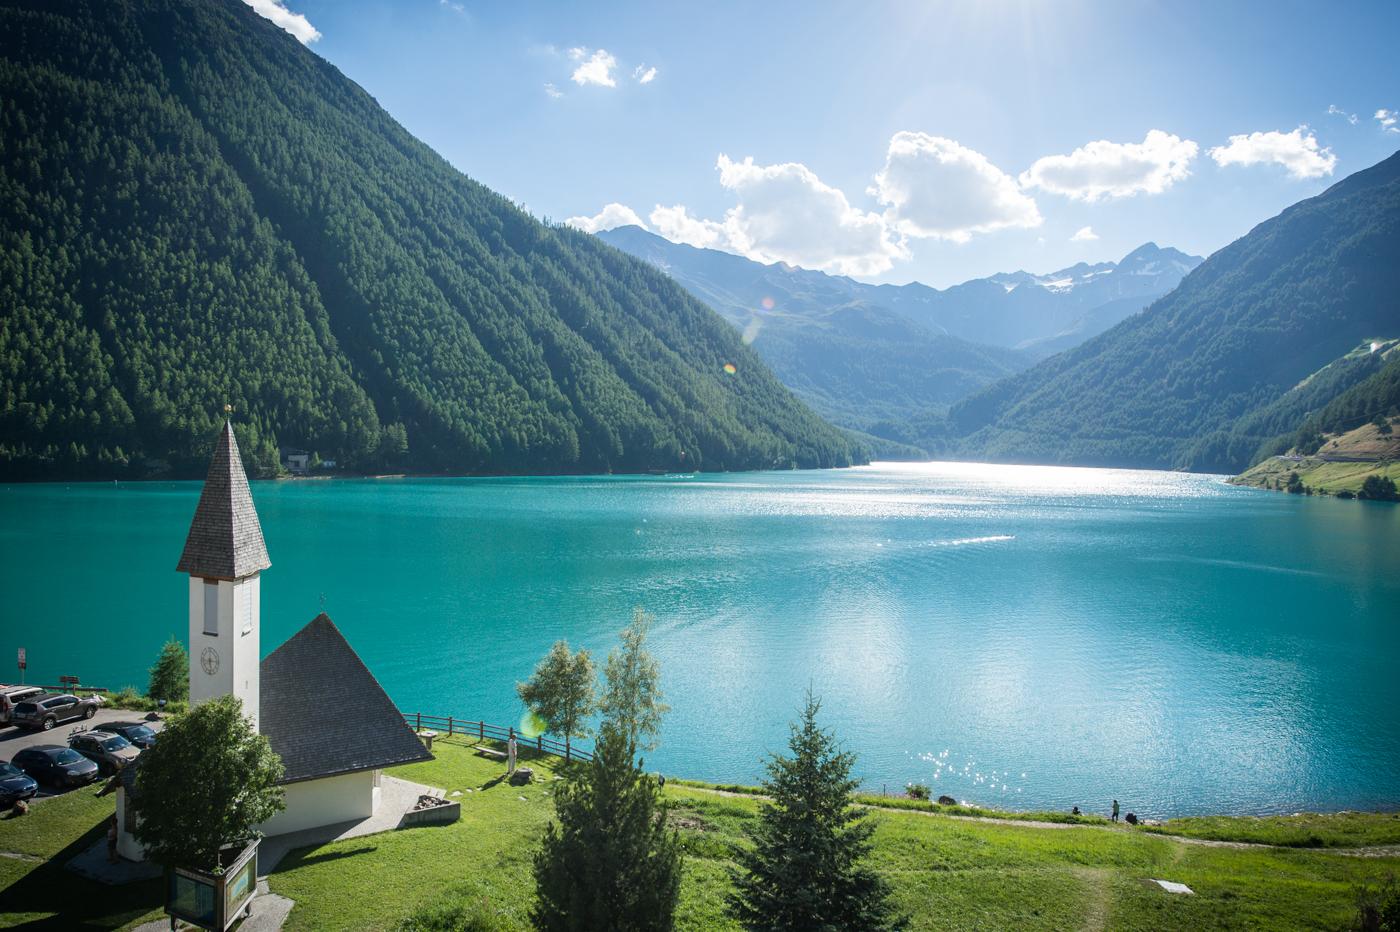 Green Vernago lake in summer